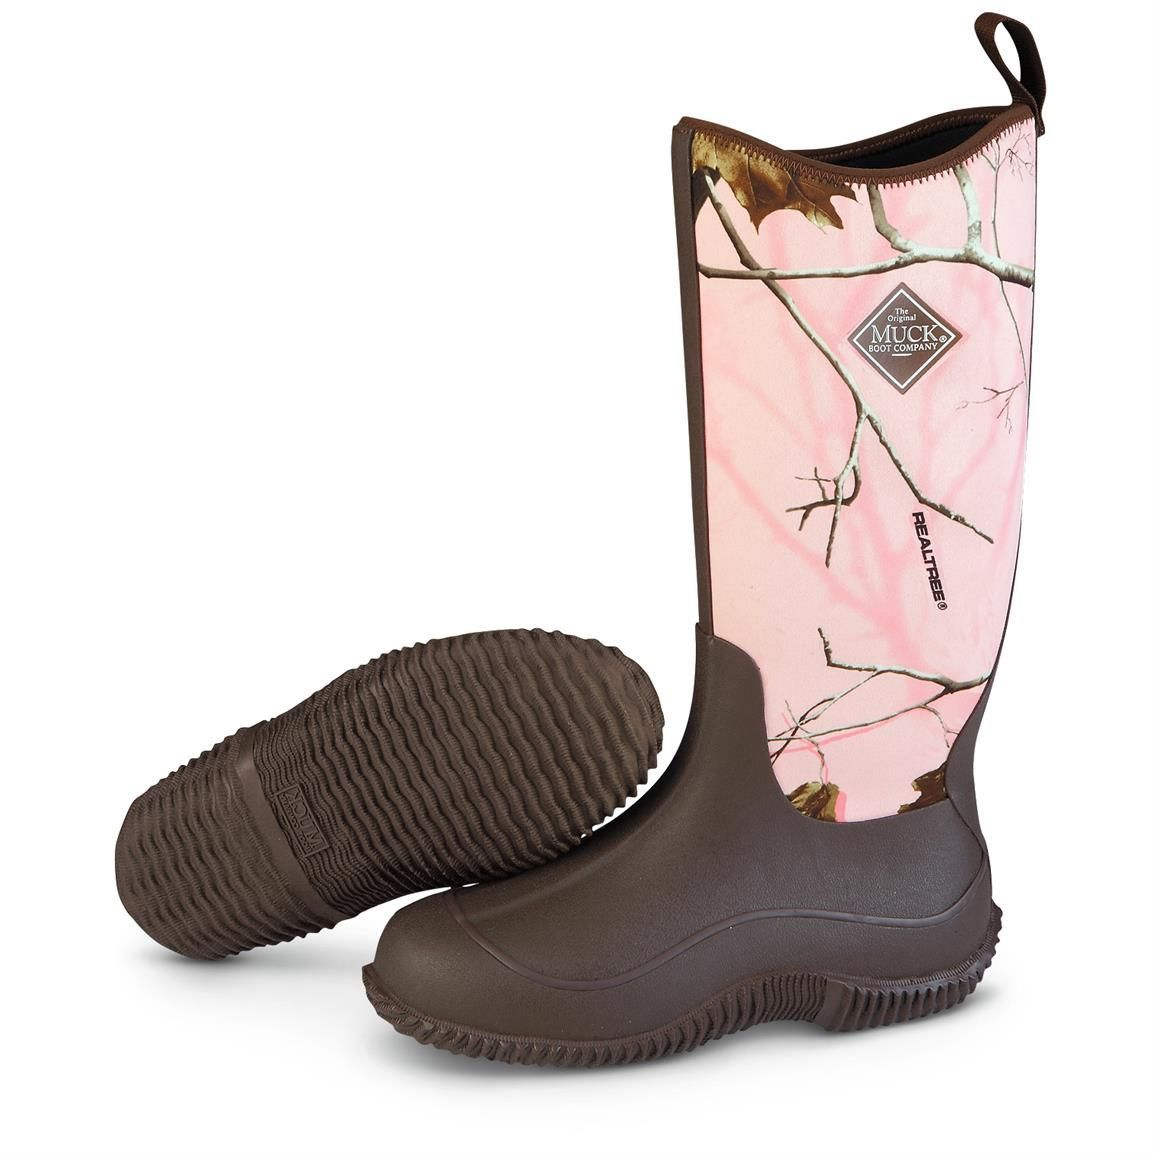 Women's Waterproof Muck Boot Company Hale Boots in Pink